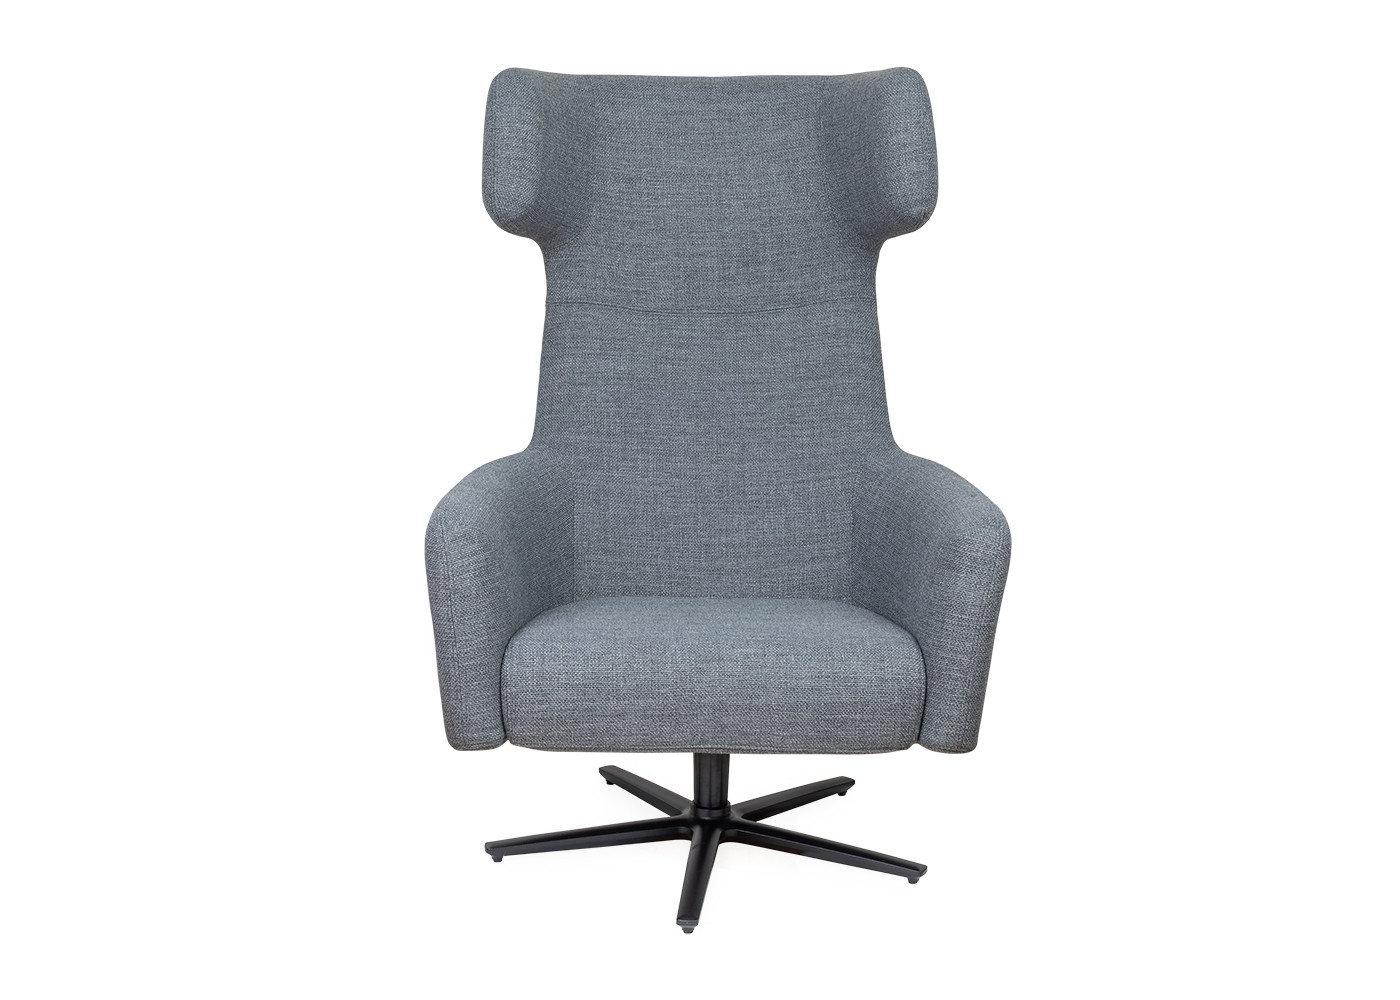 Dark Grey Swivel Chairs Pertaining To Most Popular Havana Wing Chair Swivel Base Tundra Dark Grey – Armchairs – Sofas (Gallery 7 of 20)